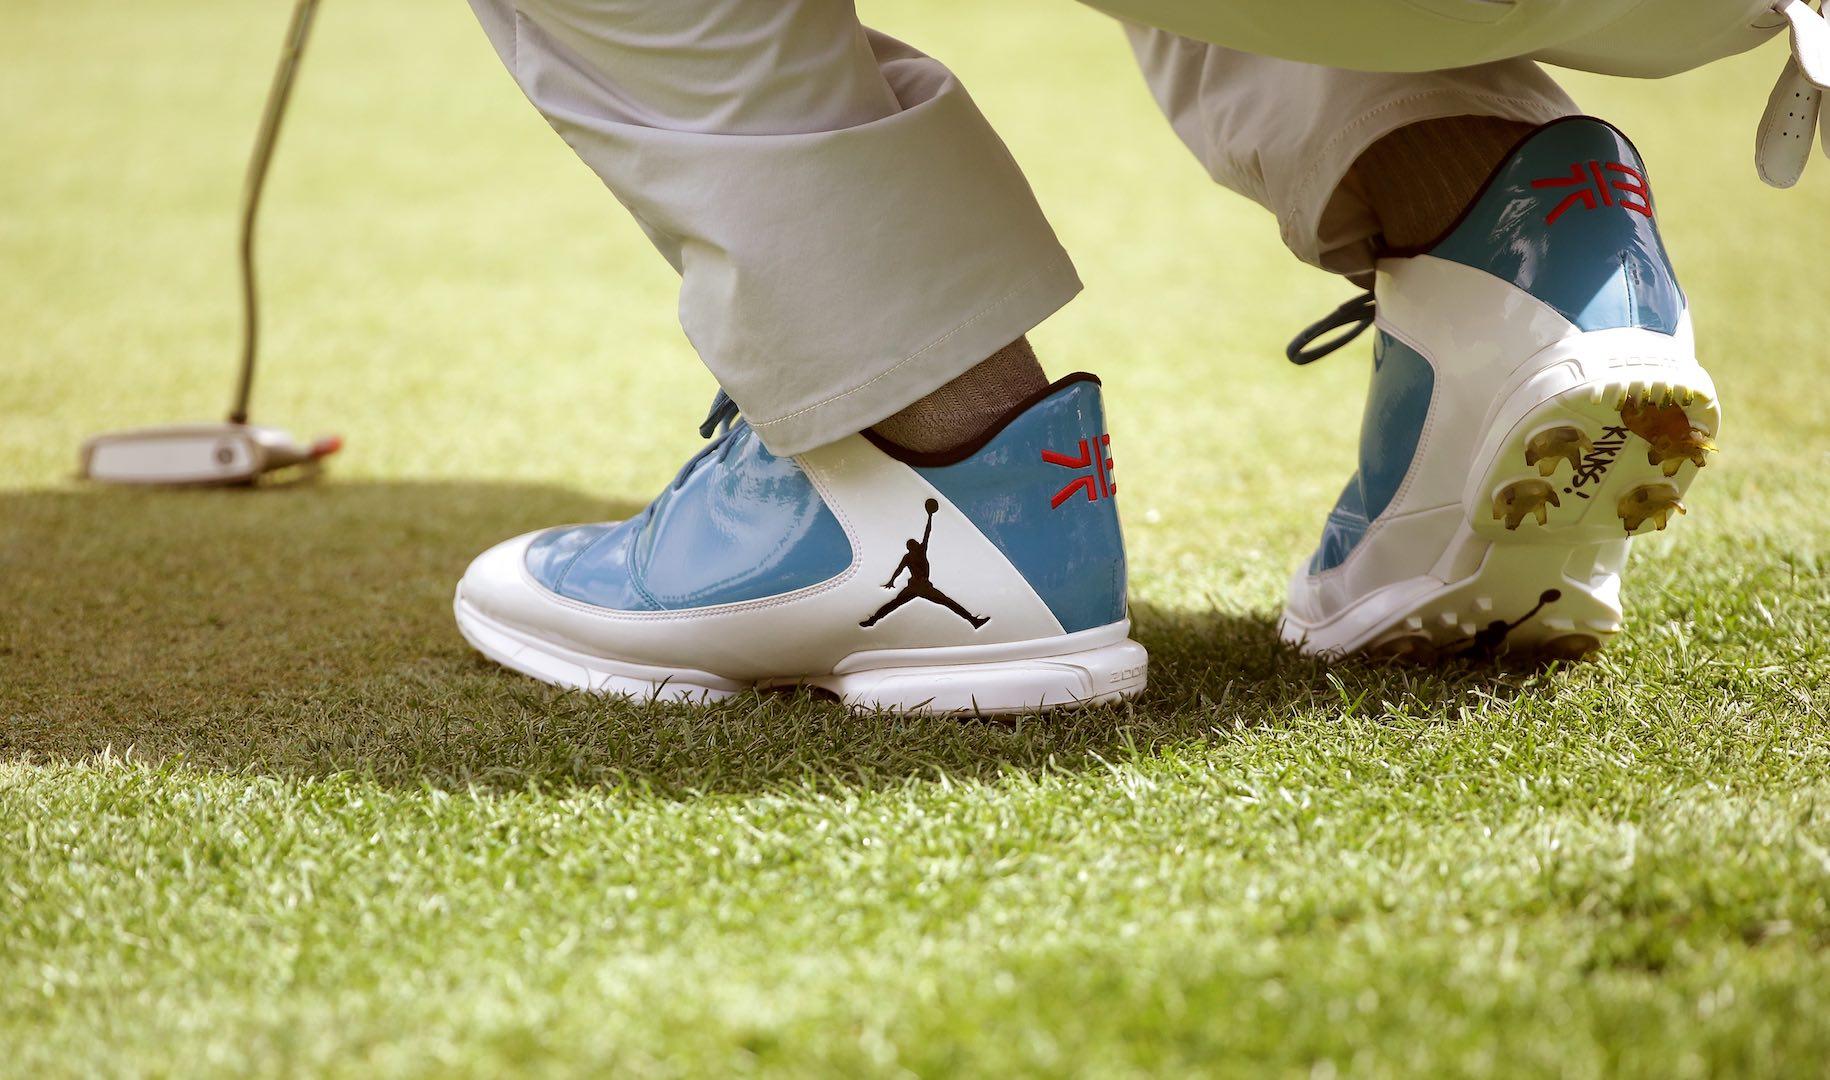 Keegan Bradley's New One Off Jordan Golf Shoes